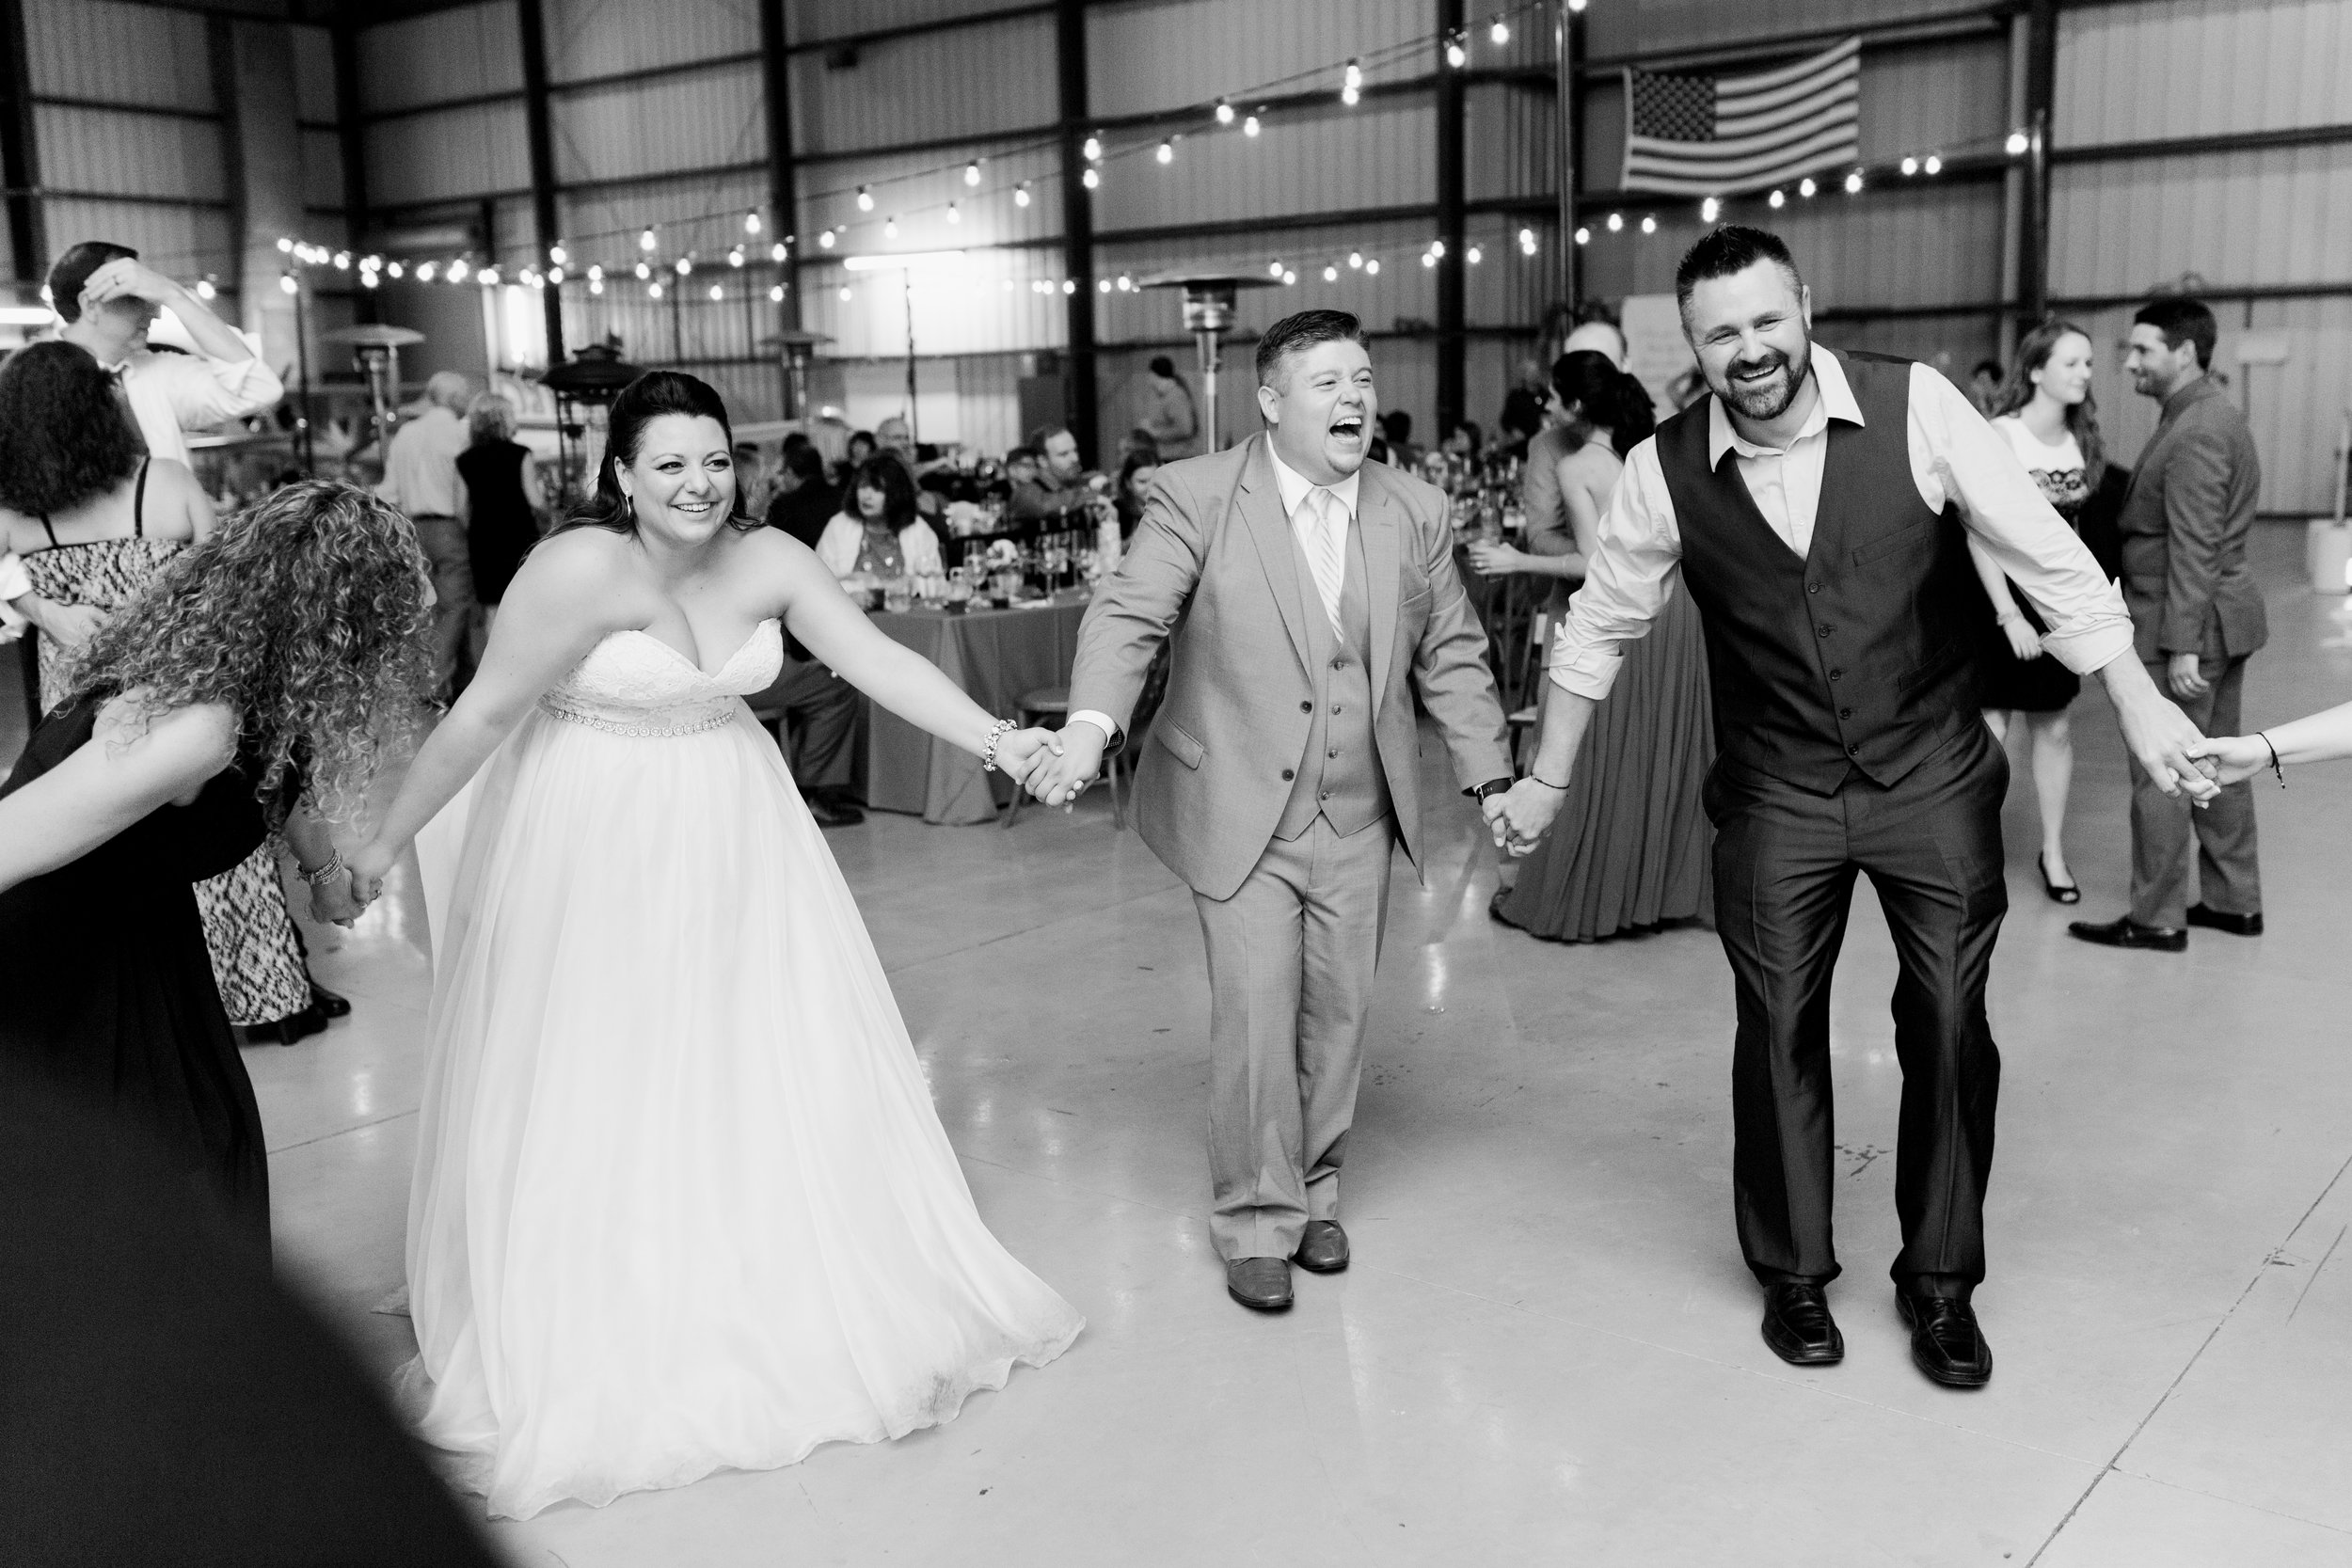 airport-hanger-wedding-at-attitude-aviation-in-livermore-132.jpg